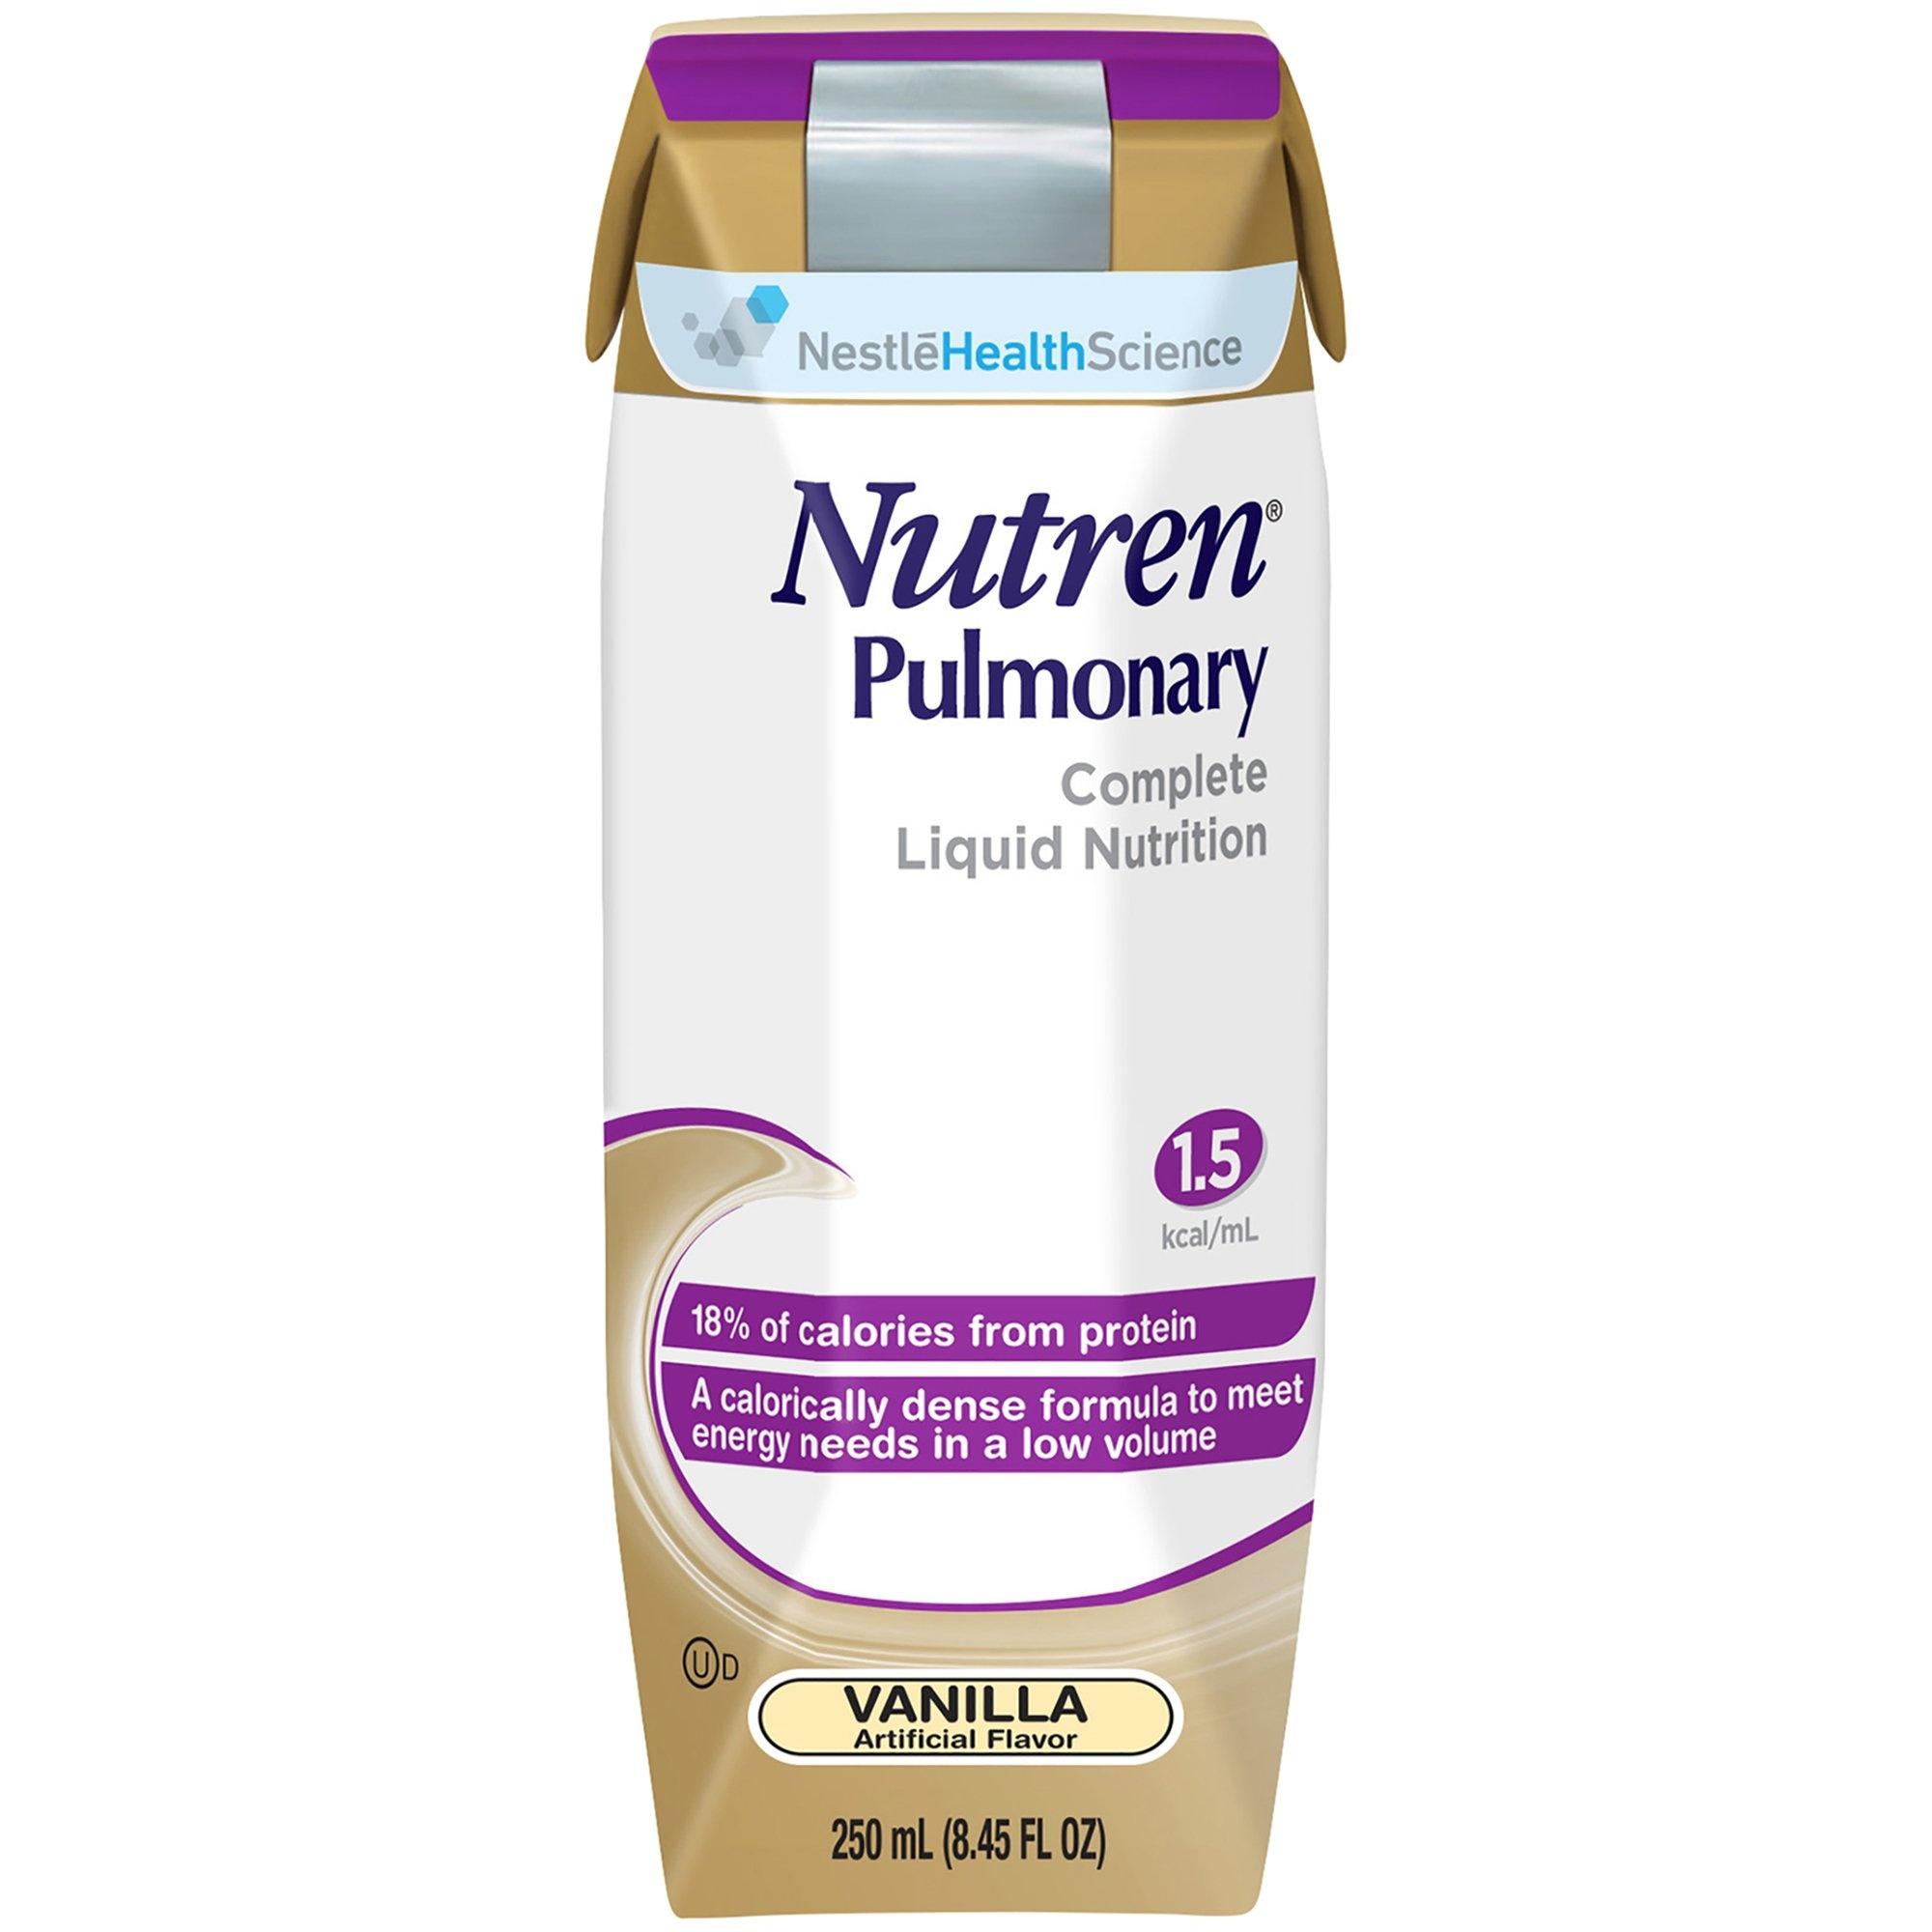 Nestle HealthScience Nutren Pulmonary Complete Liquid Nutrition Oral Supplement/Tube Feeding Formula, Vanilla, 250 mL, 00798716164801, Case of 24